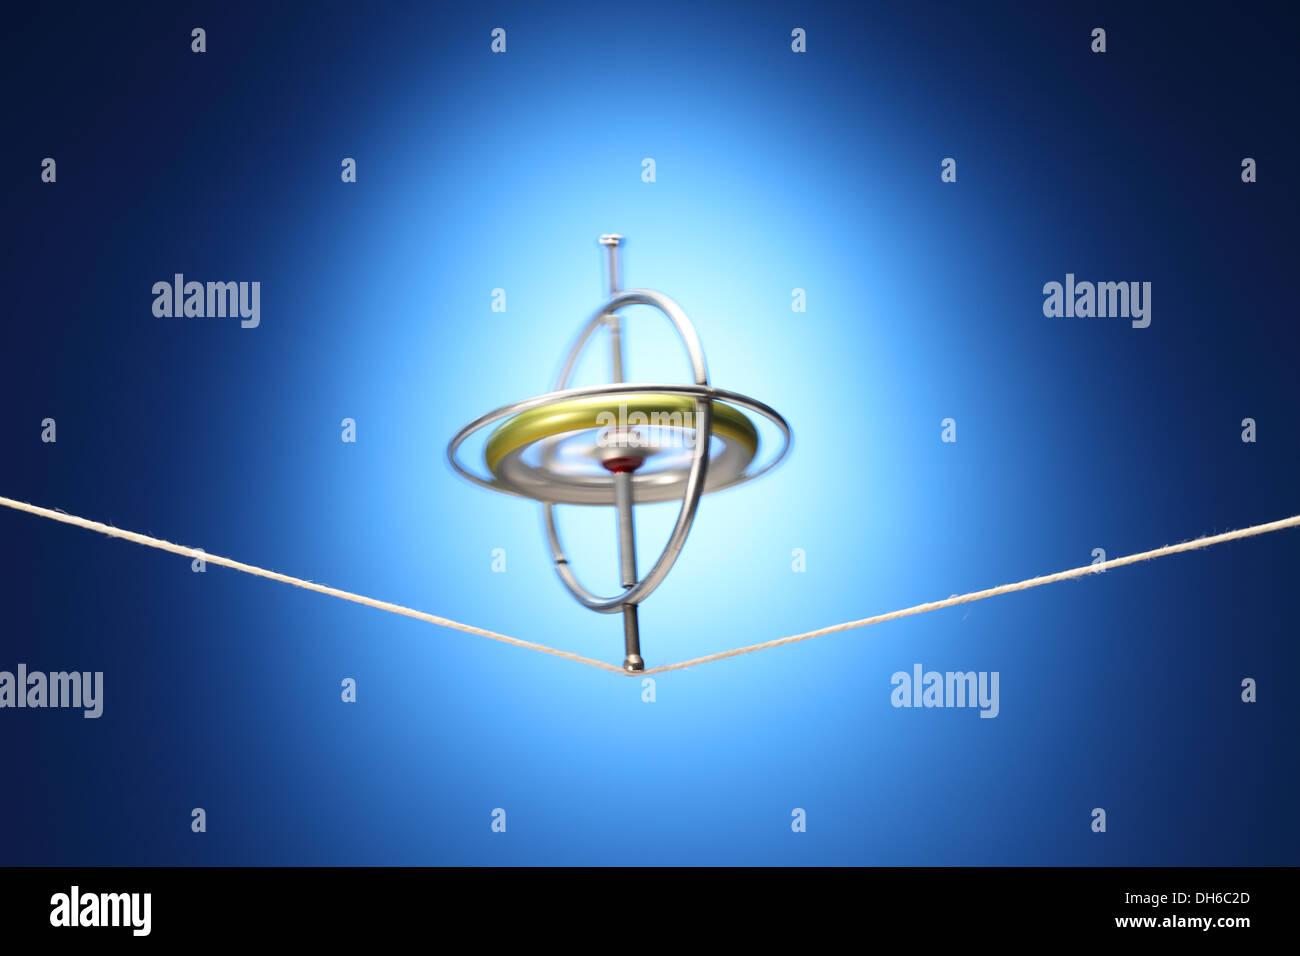 Un gyroscope en rotation en équilibre sur un chiffon de chaîne. Photo Stock